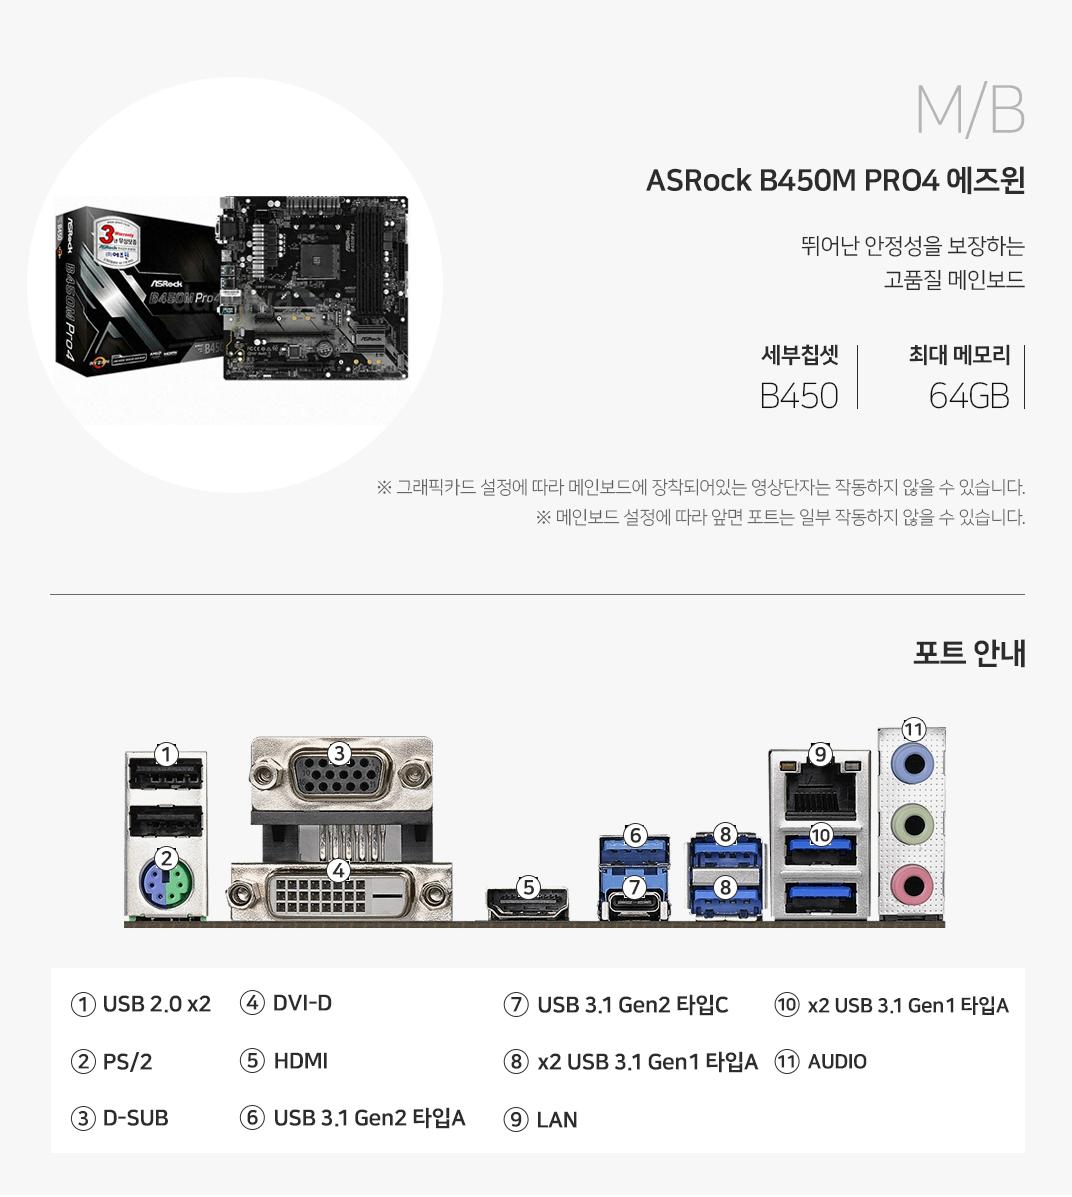 M/B ASRock B450M PRO4 에즈윈 뛰어난 안정성을 보장하는 고품질 메인보드 세부칩셋 B450 최대메모리 64GB 그래픽 설정에 따라 메인보드에 장착되어 있는 영상단자는 작동하지 않을 수 있습니다. 메인보드 설정에 따라 앞면 포트는 일부 작동하지 않을 수 있습니다.